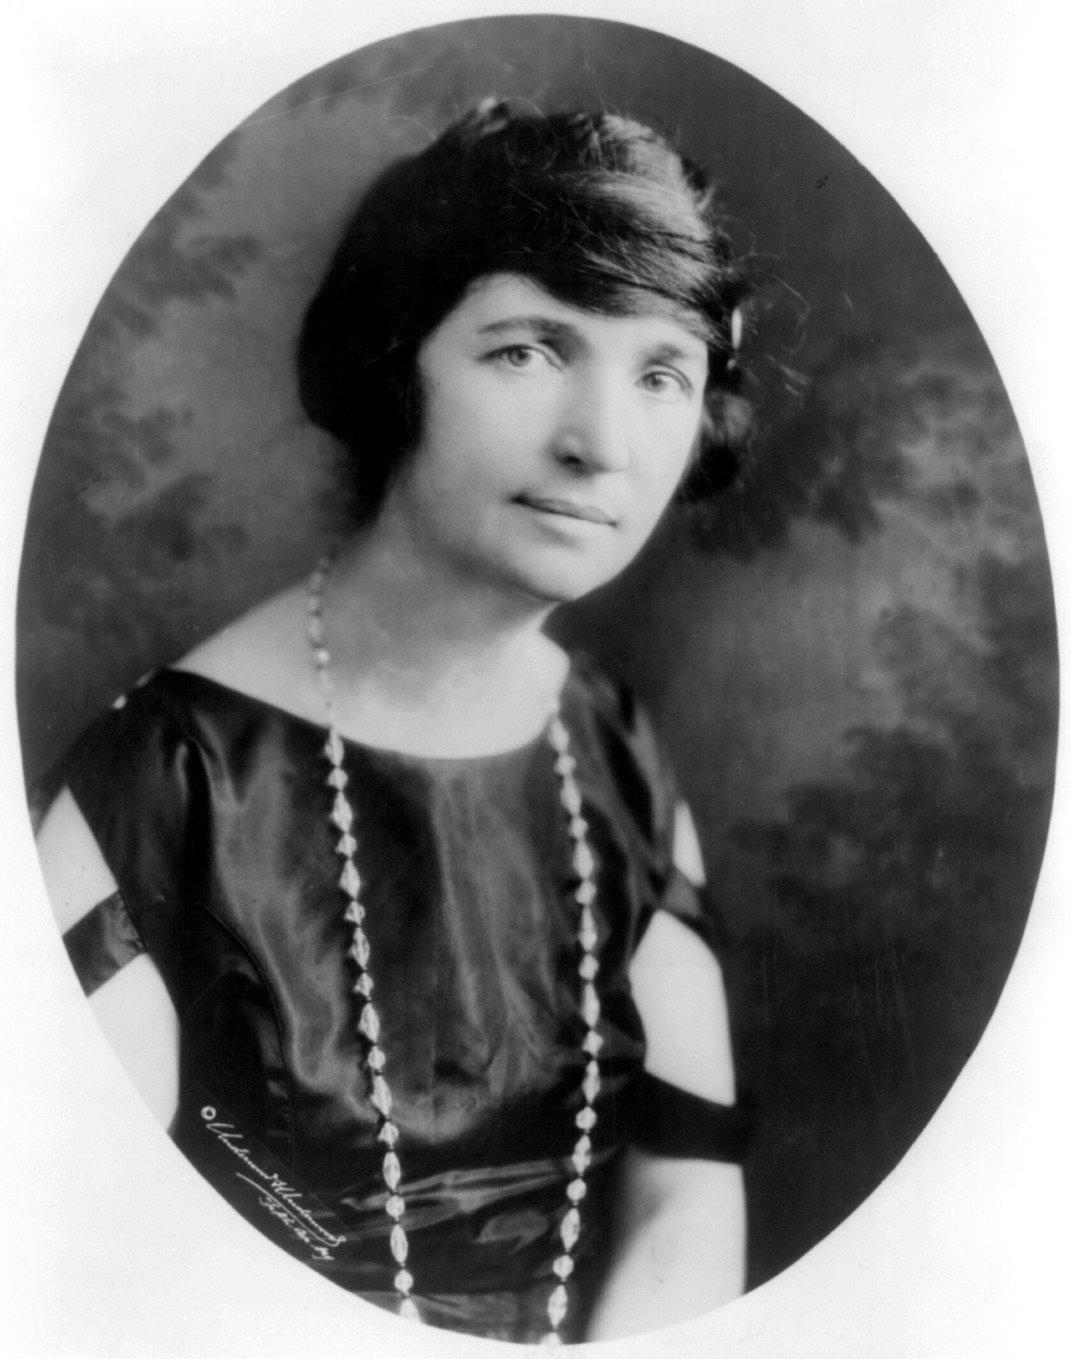 MargaretSanger-Underwood.LOC.jpg